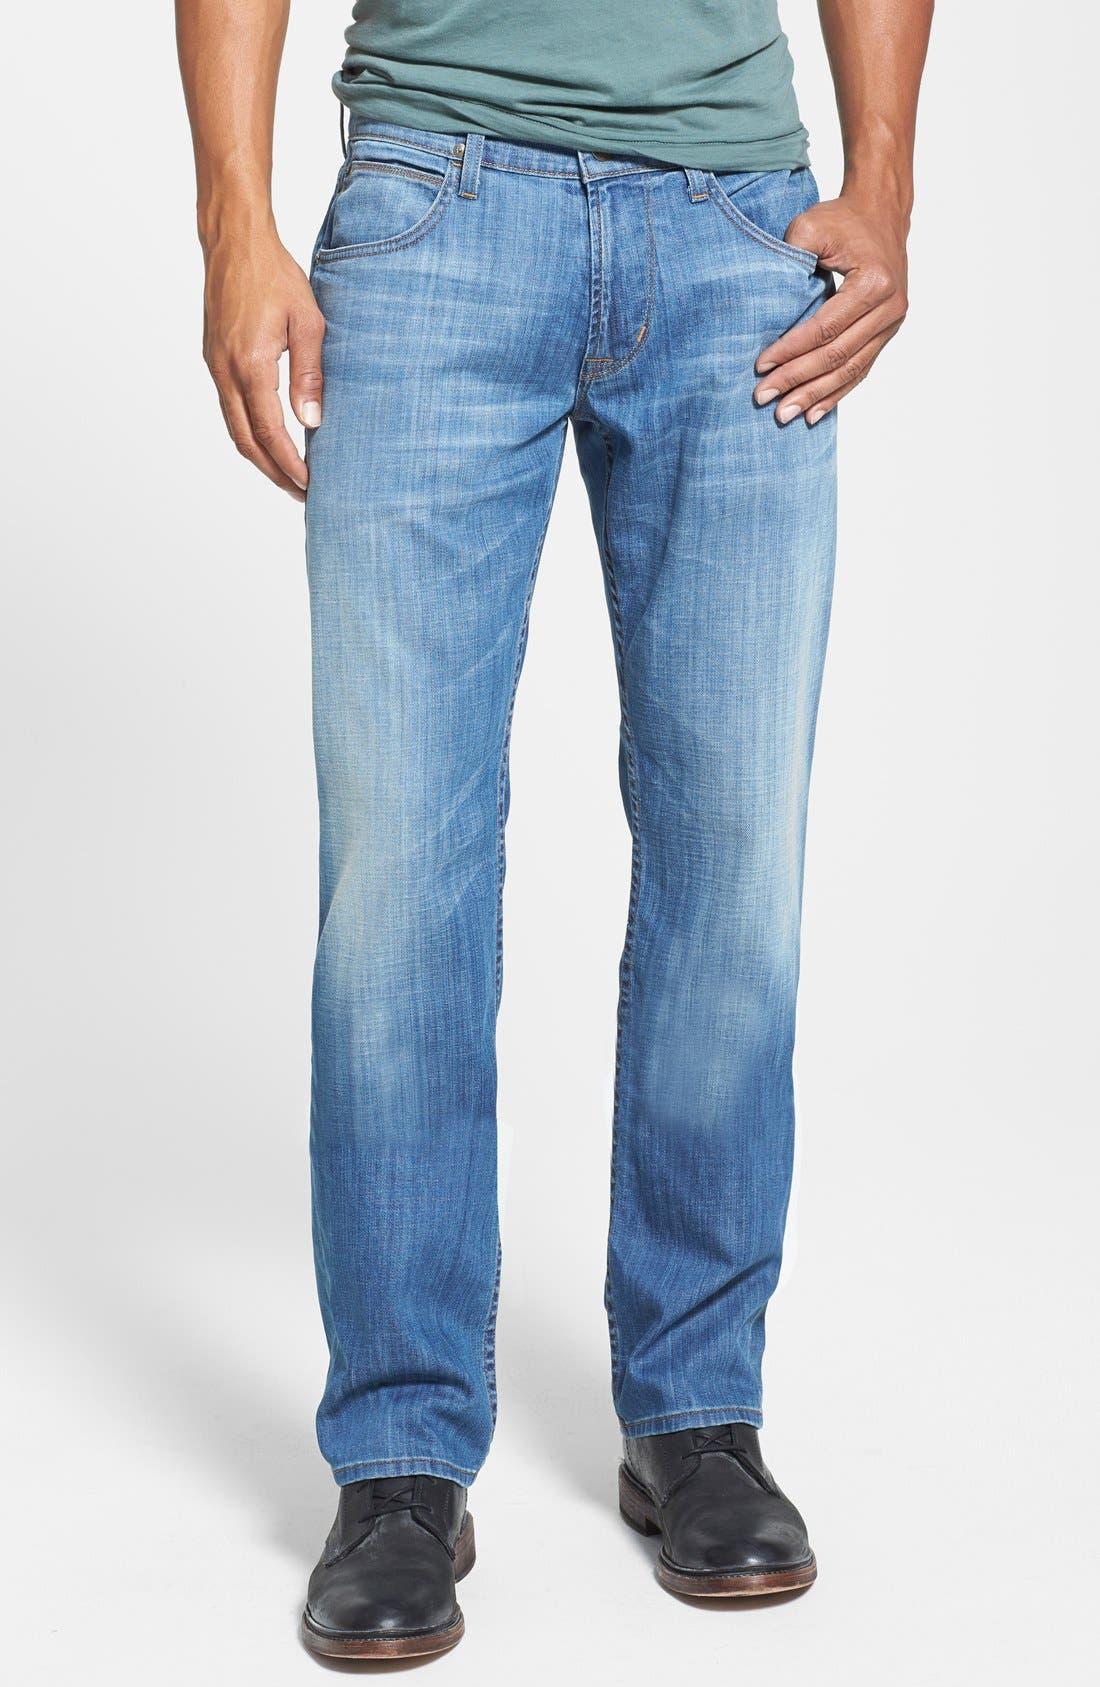 Alternate Image 1 Selected - Hudson Jeans 'Byron' Straight Leg Jeans (Comrade)